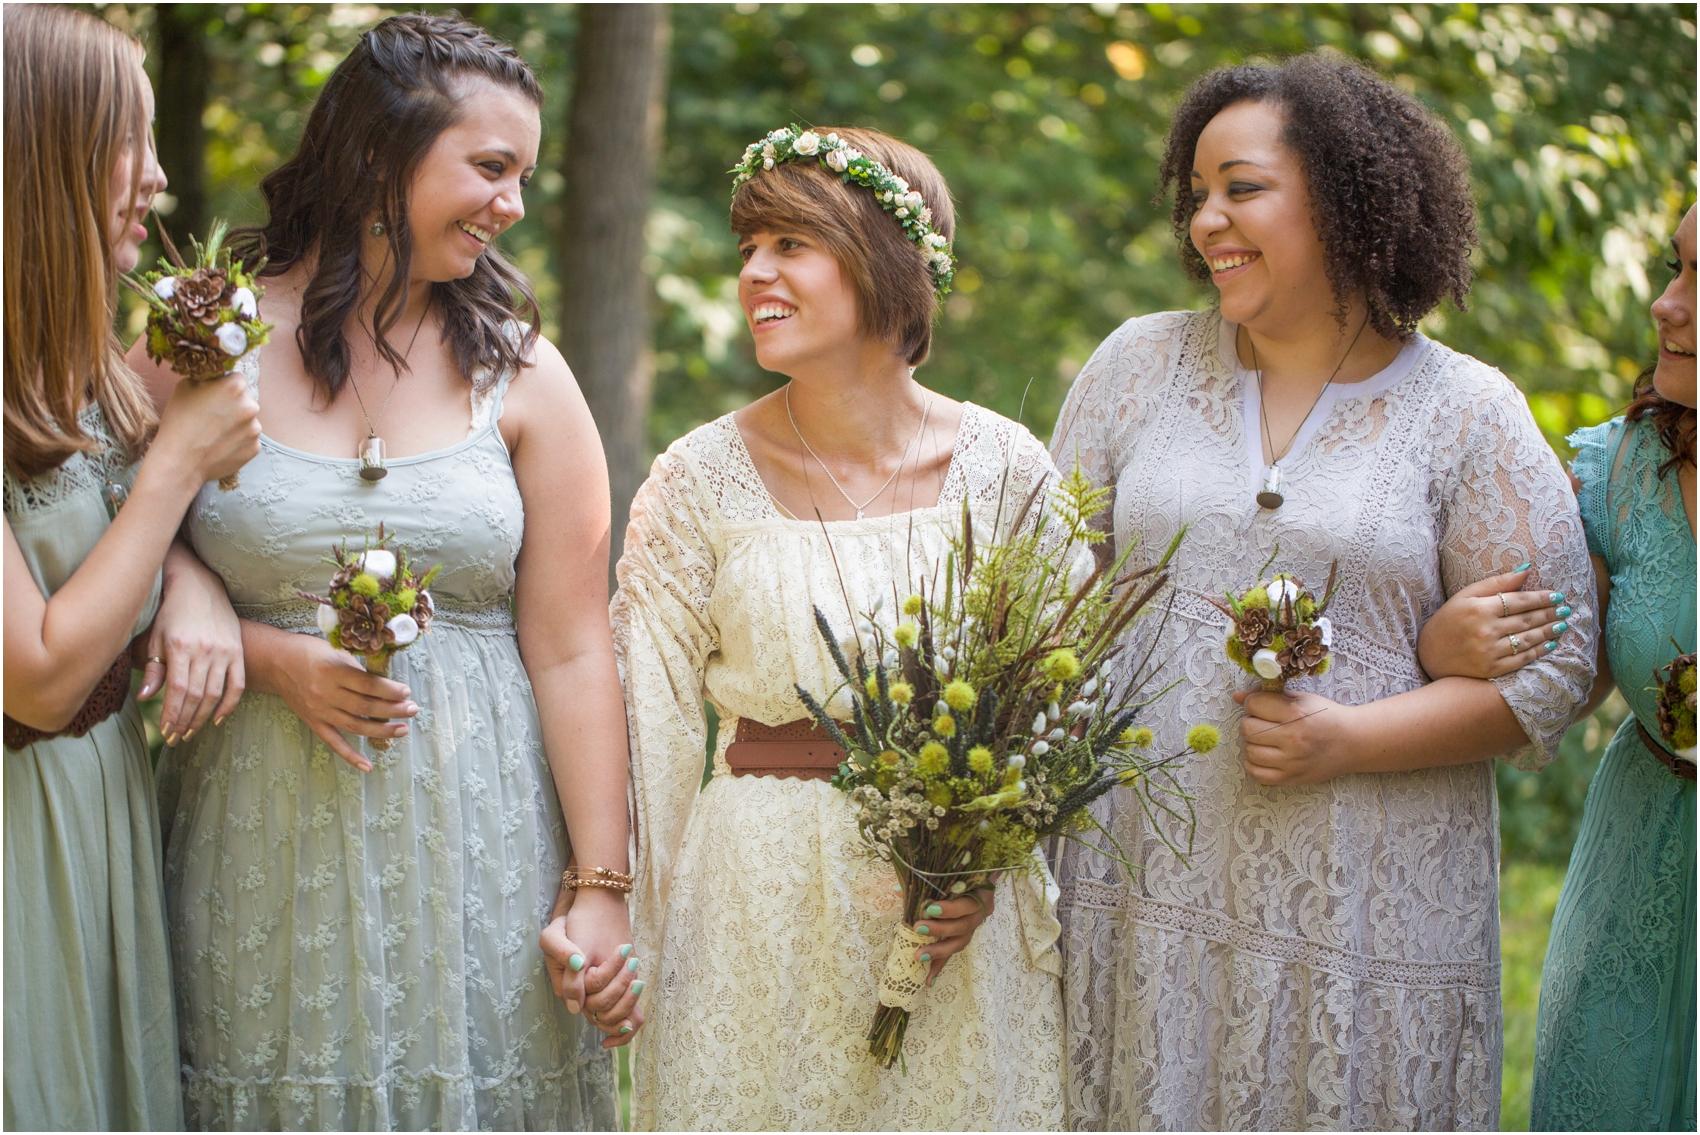 Southern-Illinois-Bohemian-Holy-Boulders-Autumn-Wedding_0925.jpg